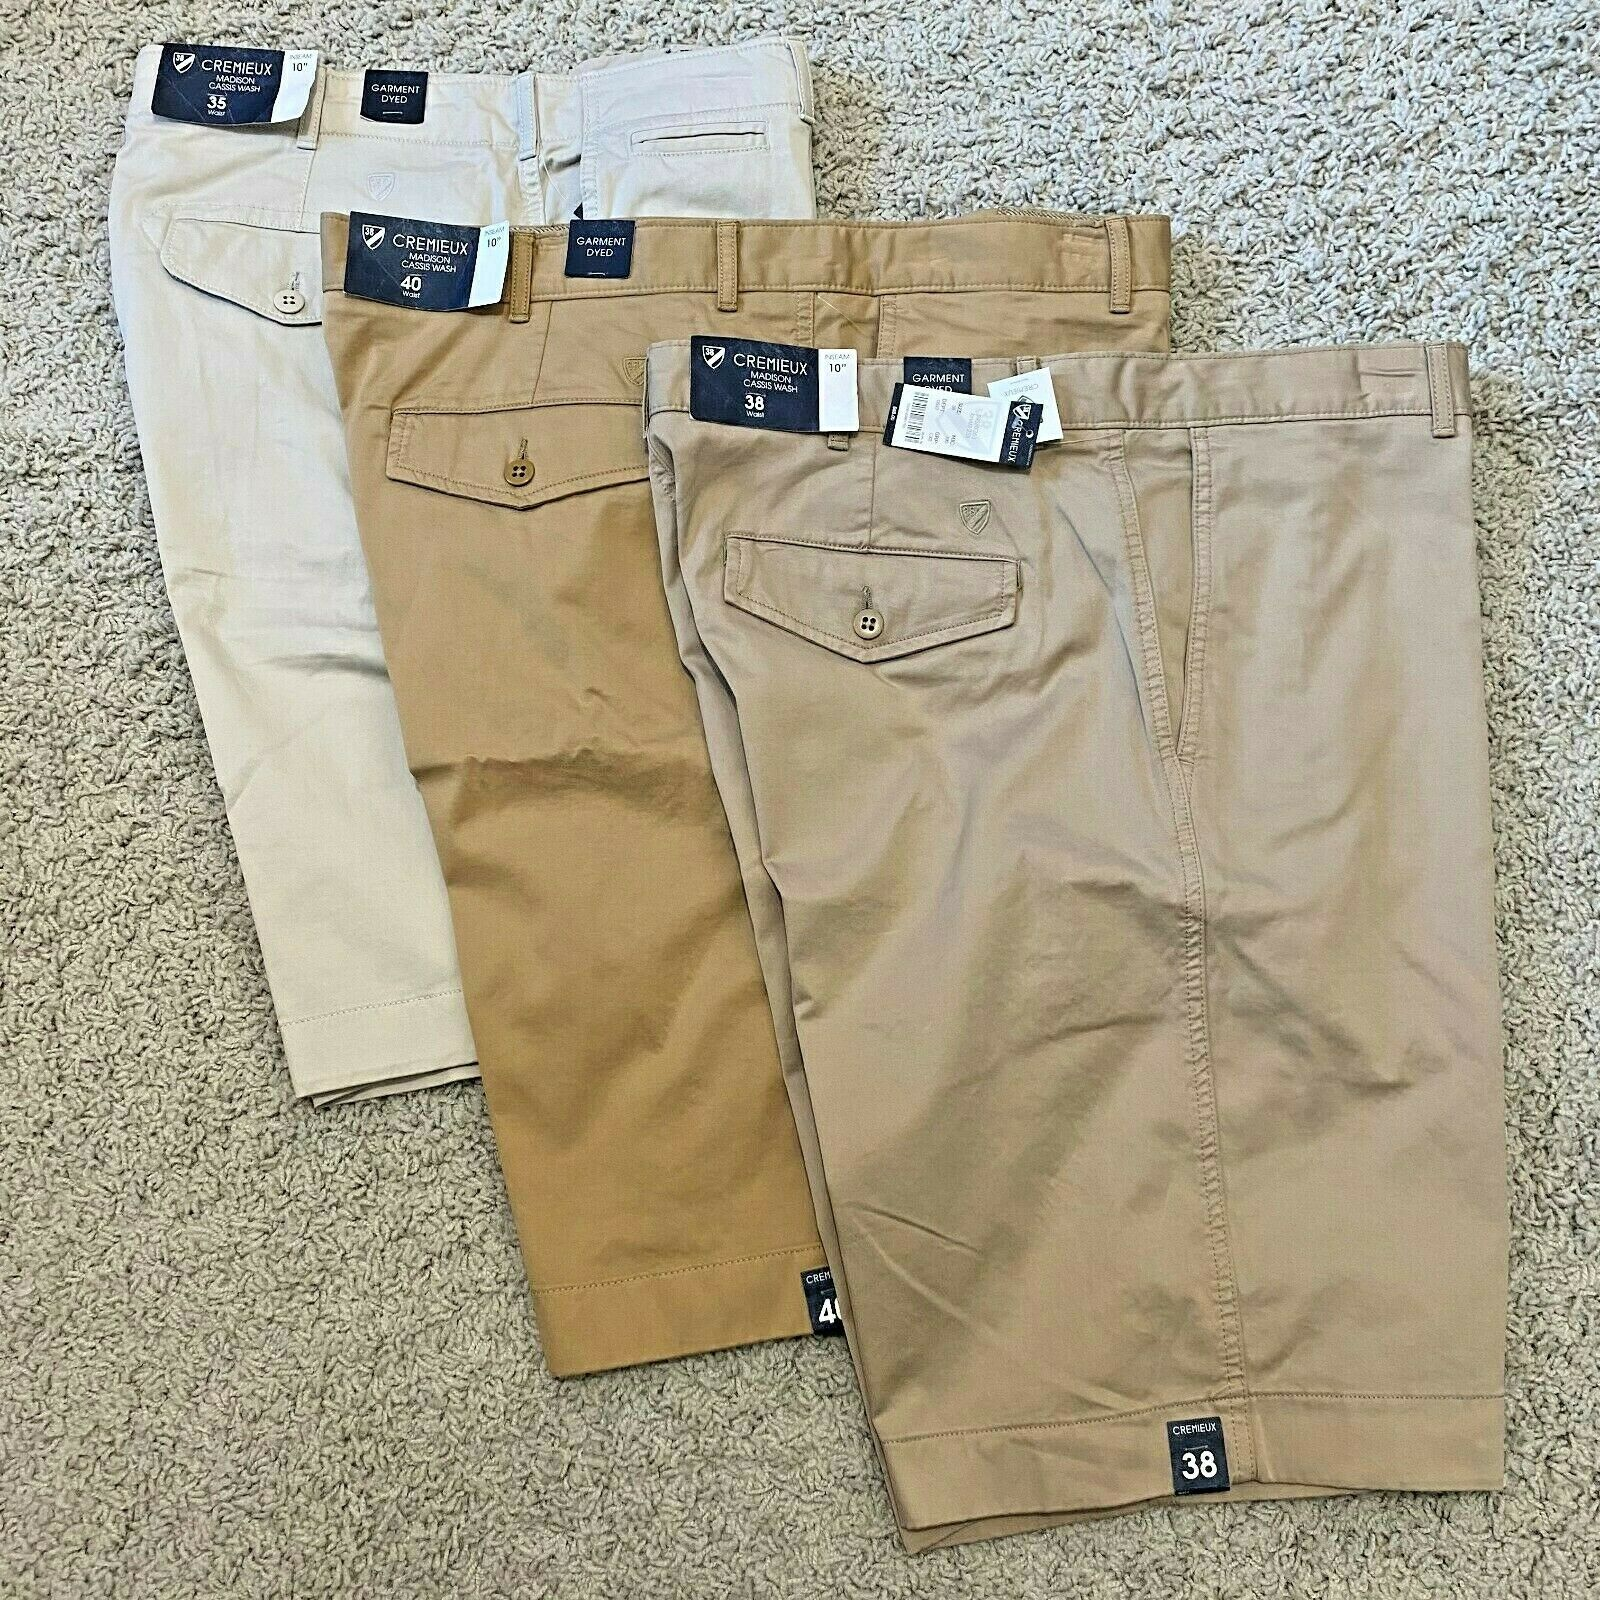 Cremieux Mens Madison Khaki Shorts Chino 10″ Cassis Wash 34 35 36 38 40 42 Clothing, Shoes & Accessories